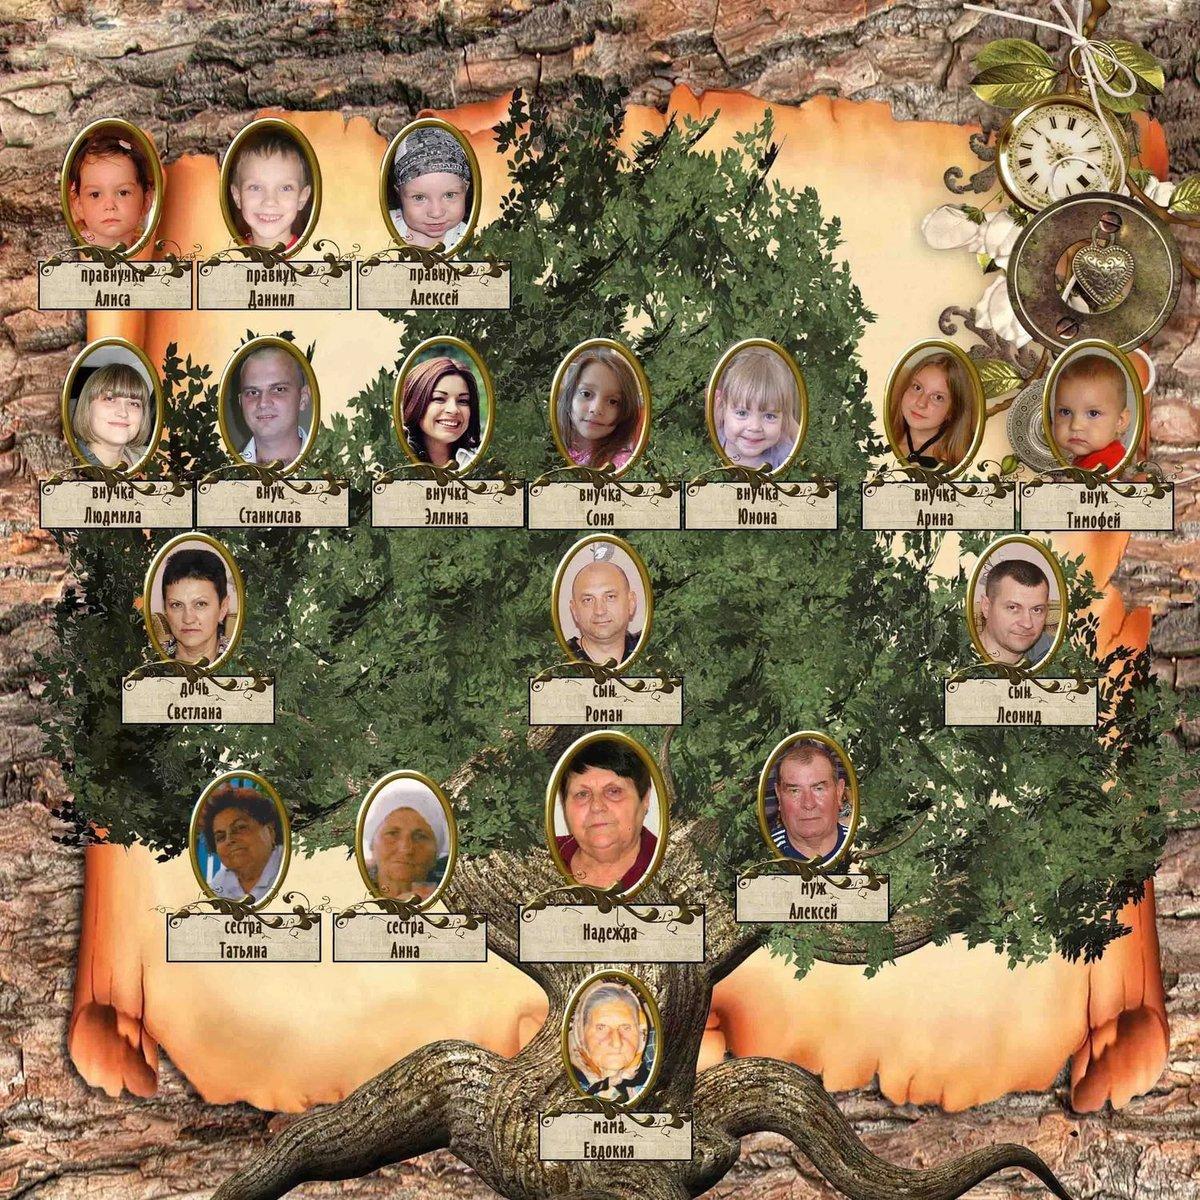 генеологичне дерево шаблон фото кекс